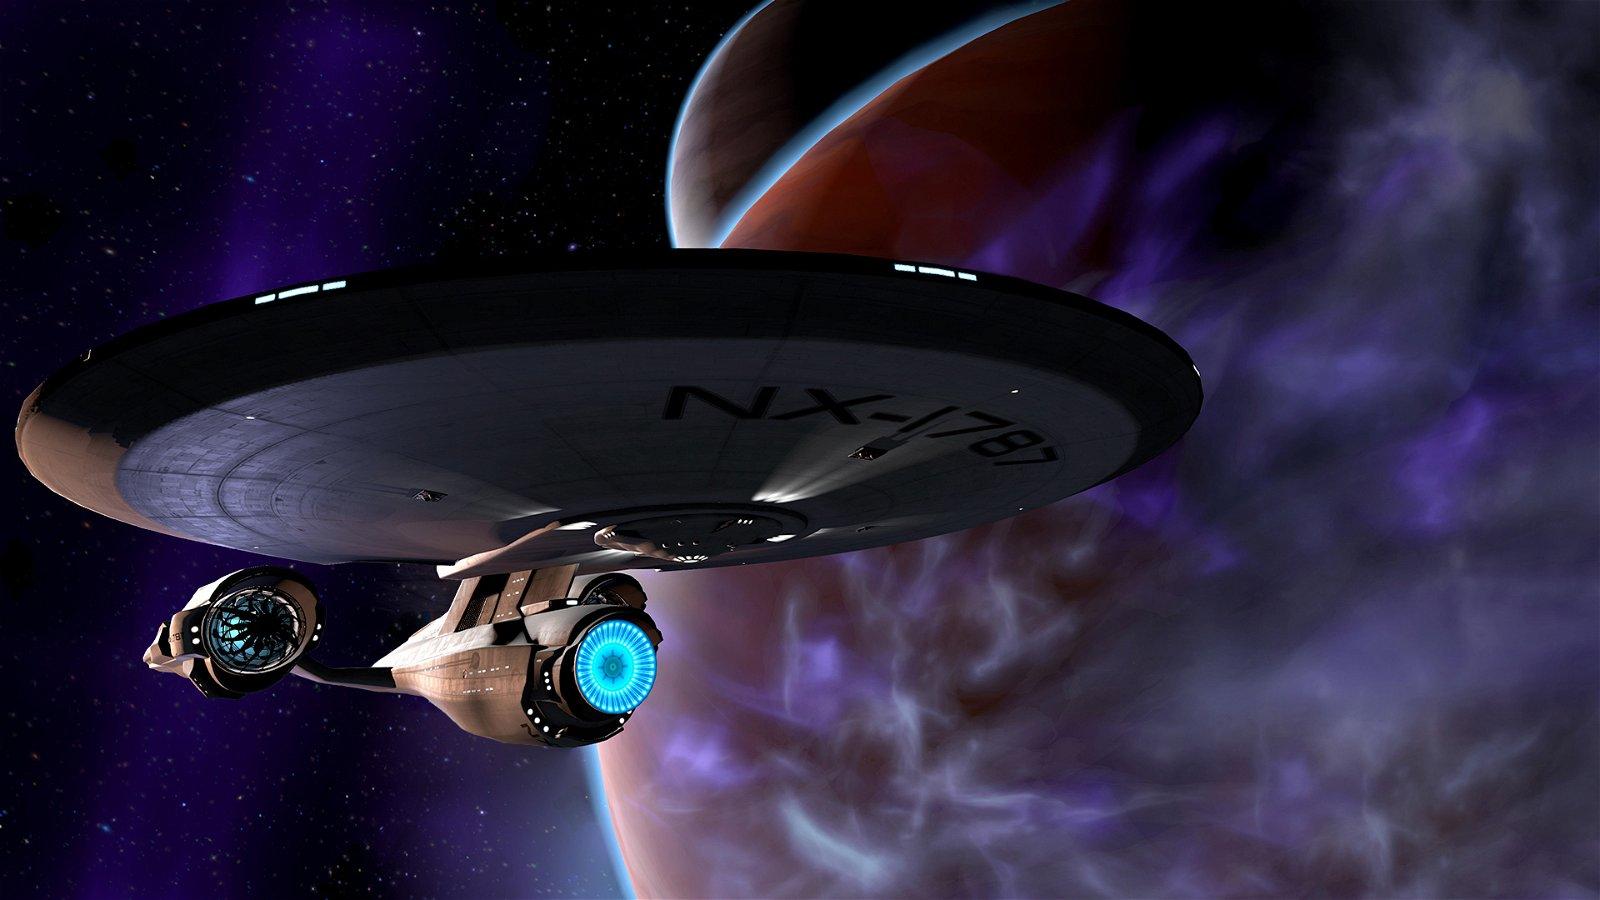 HTC Offering Free Copy Of Star Trek Bridge Crew For New Customers